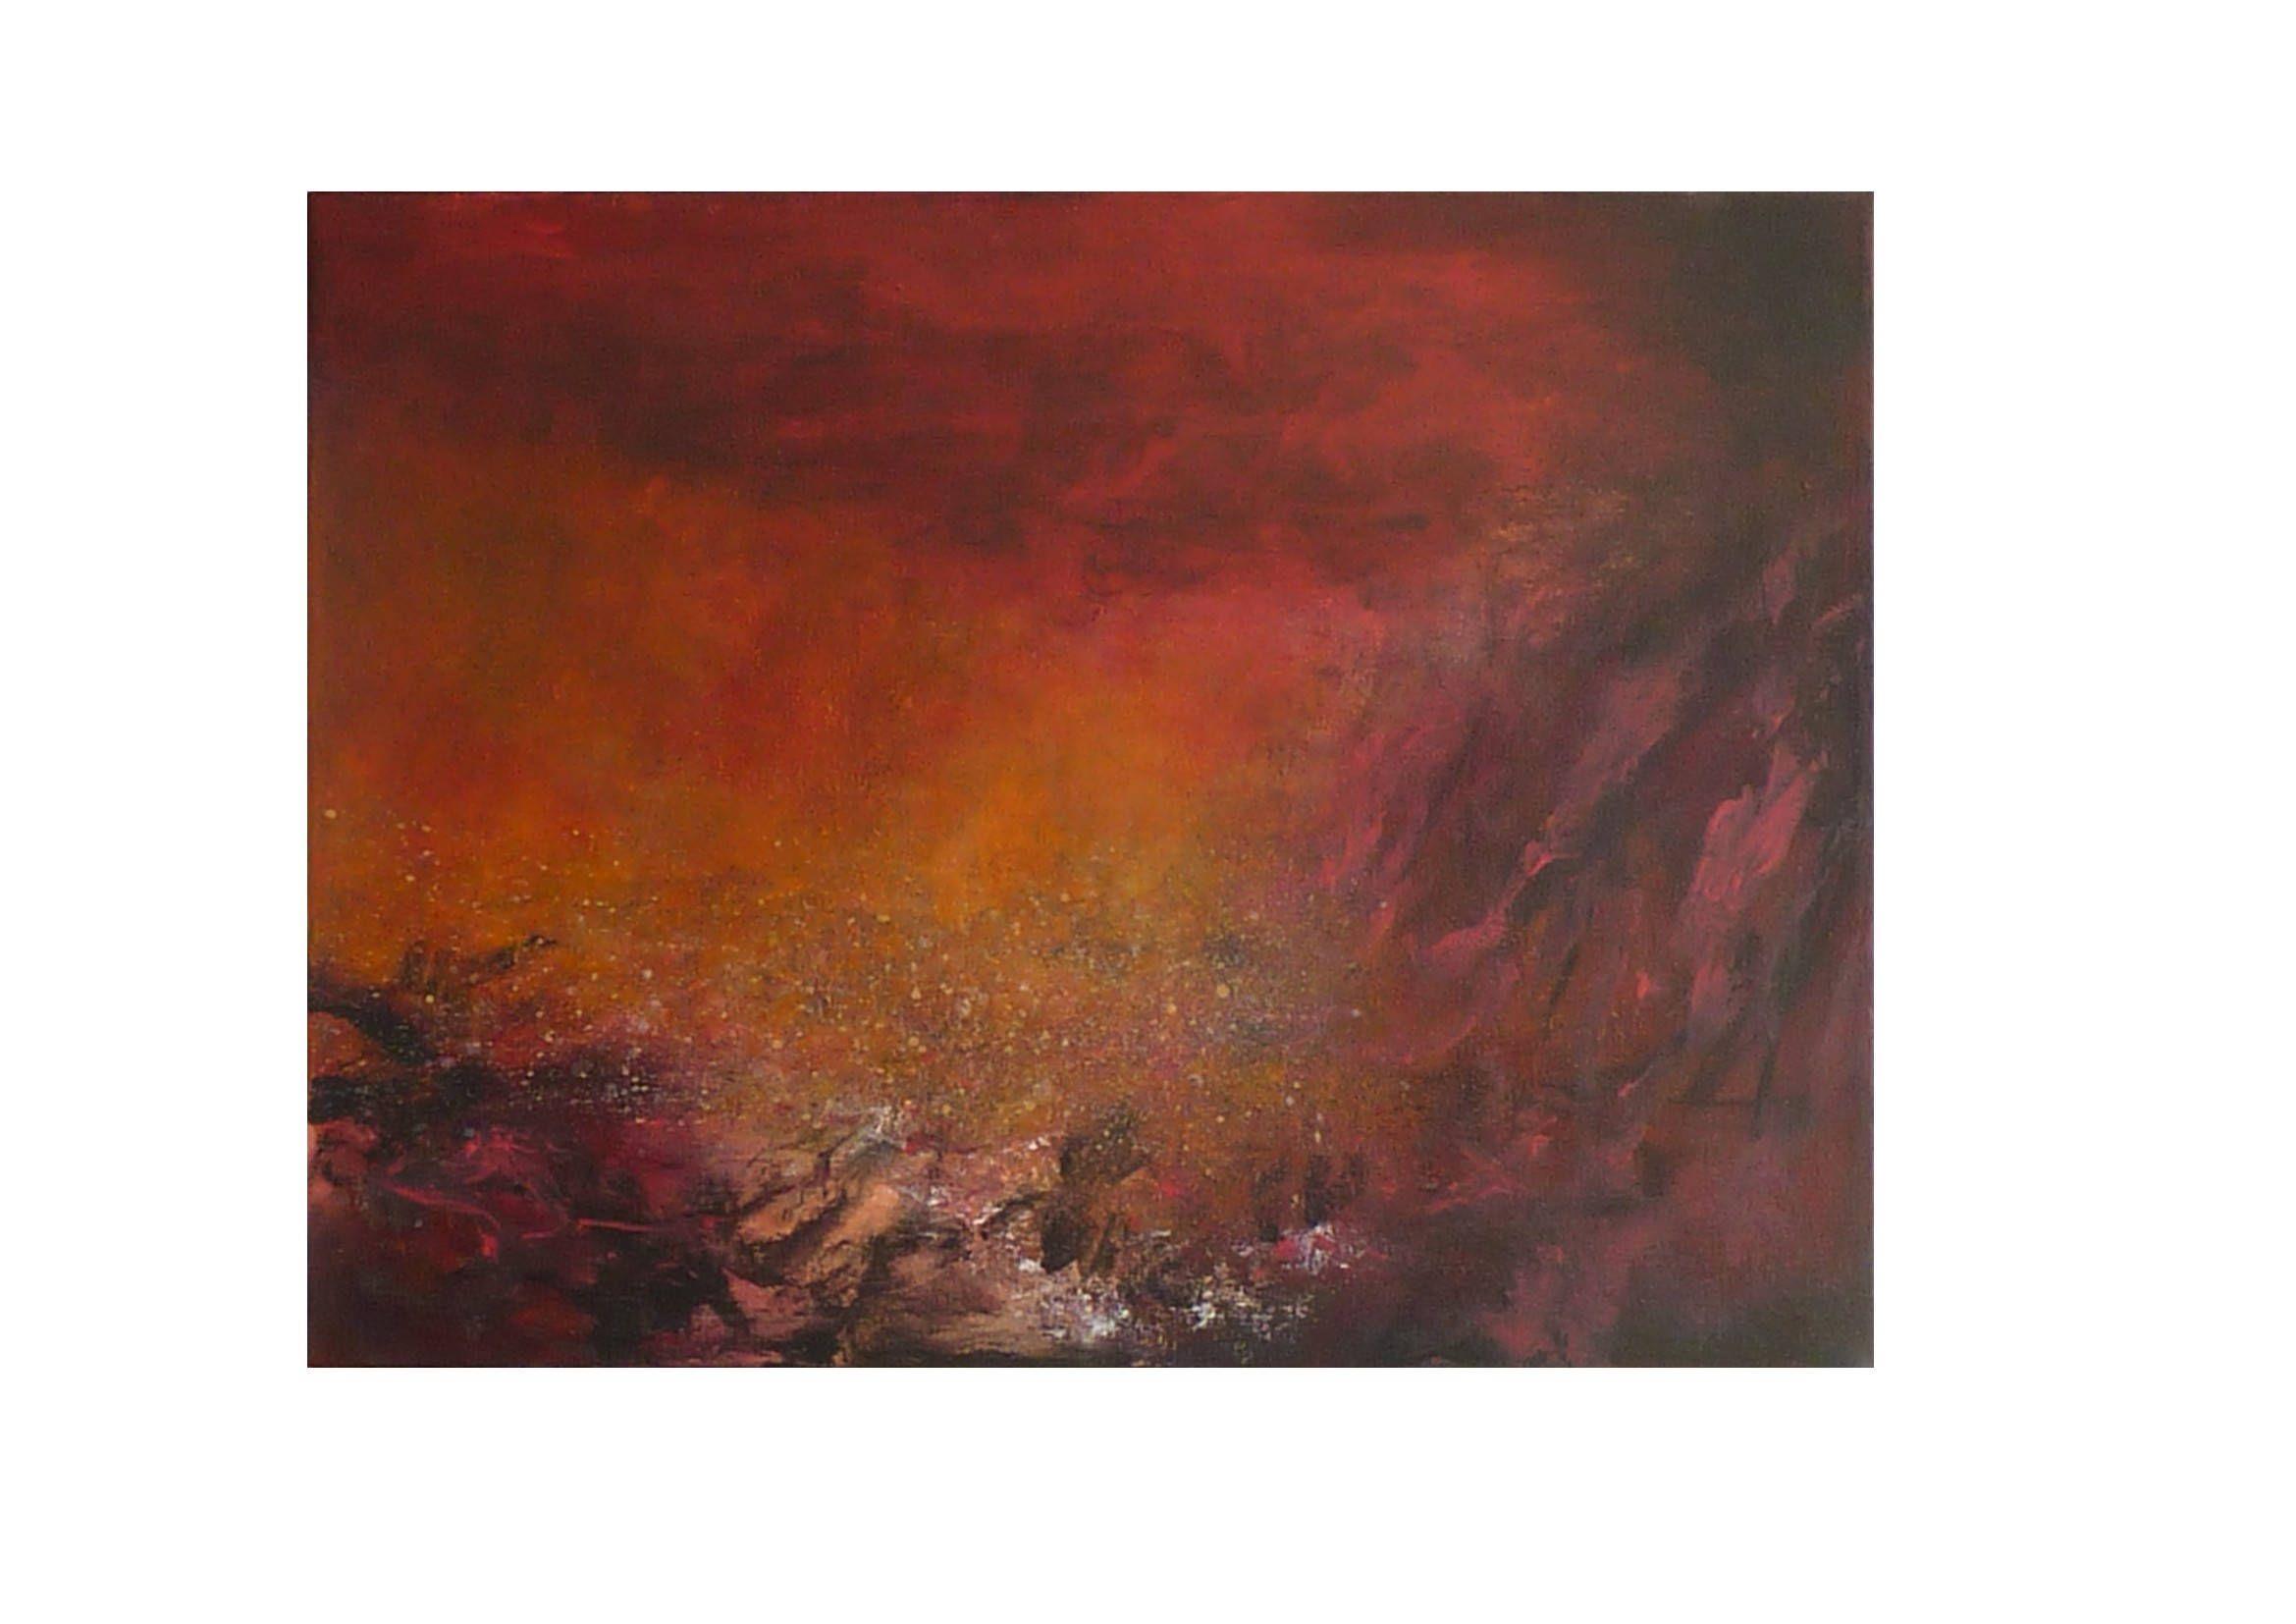 Tableau abstrait rouge orange noir original paysage abstraction ...